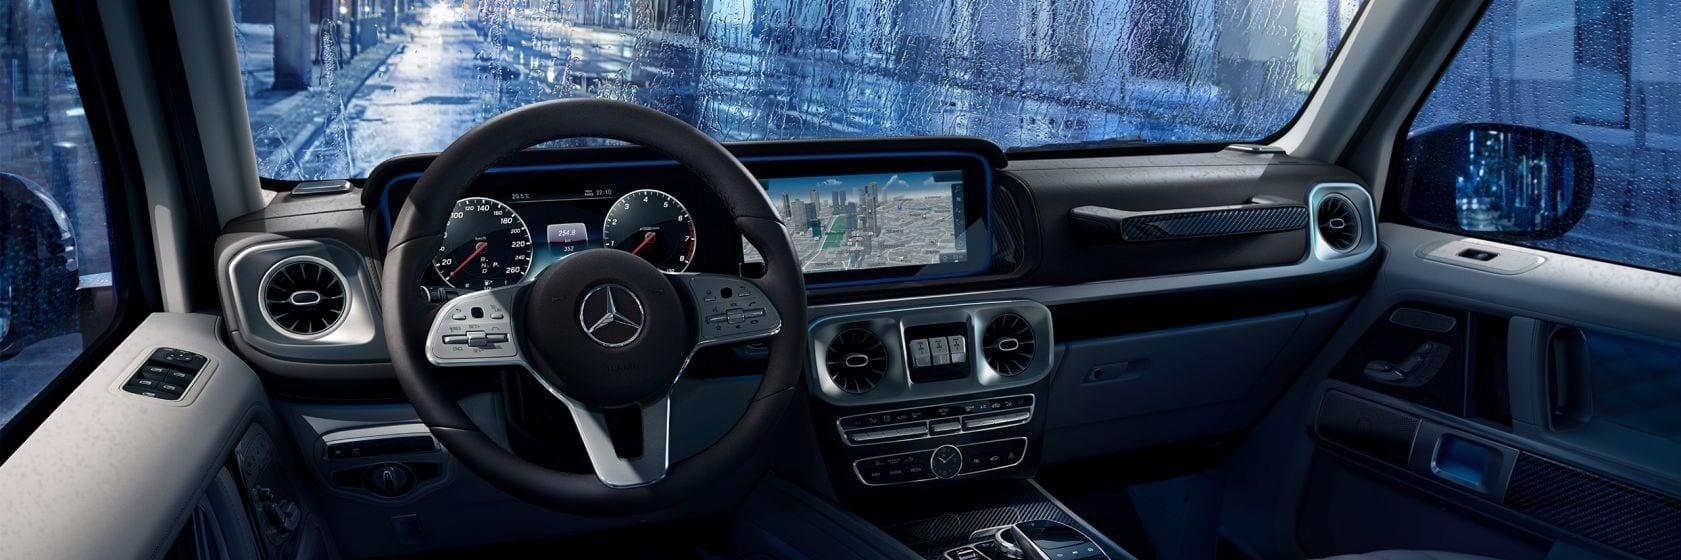 Комфорт Mercedes-Benz G-Class